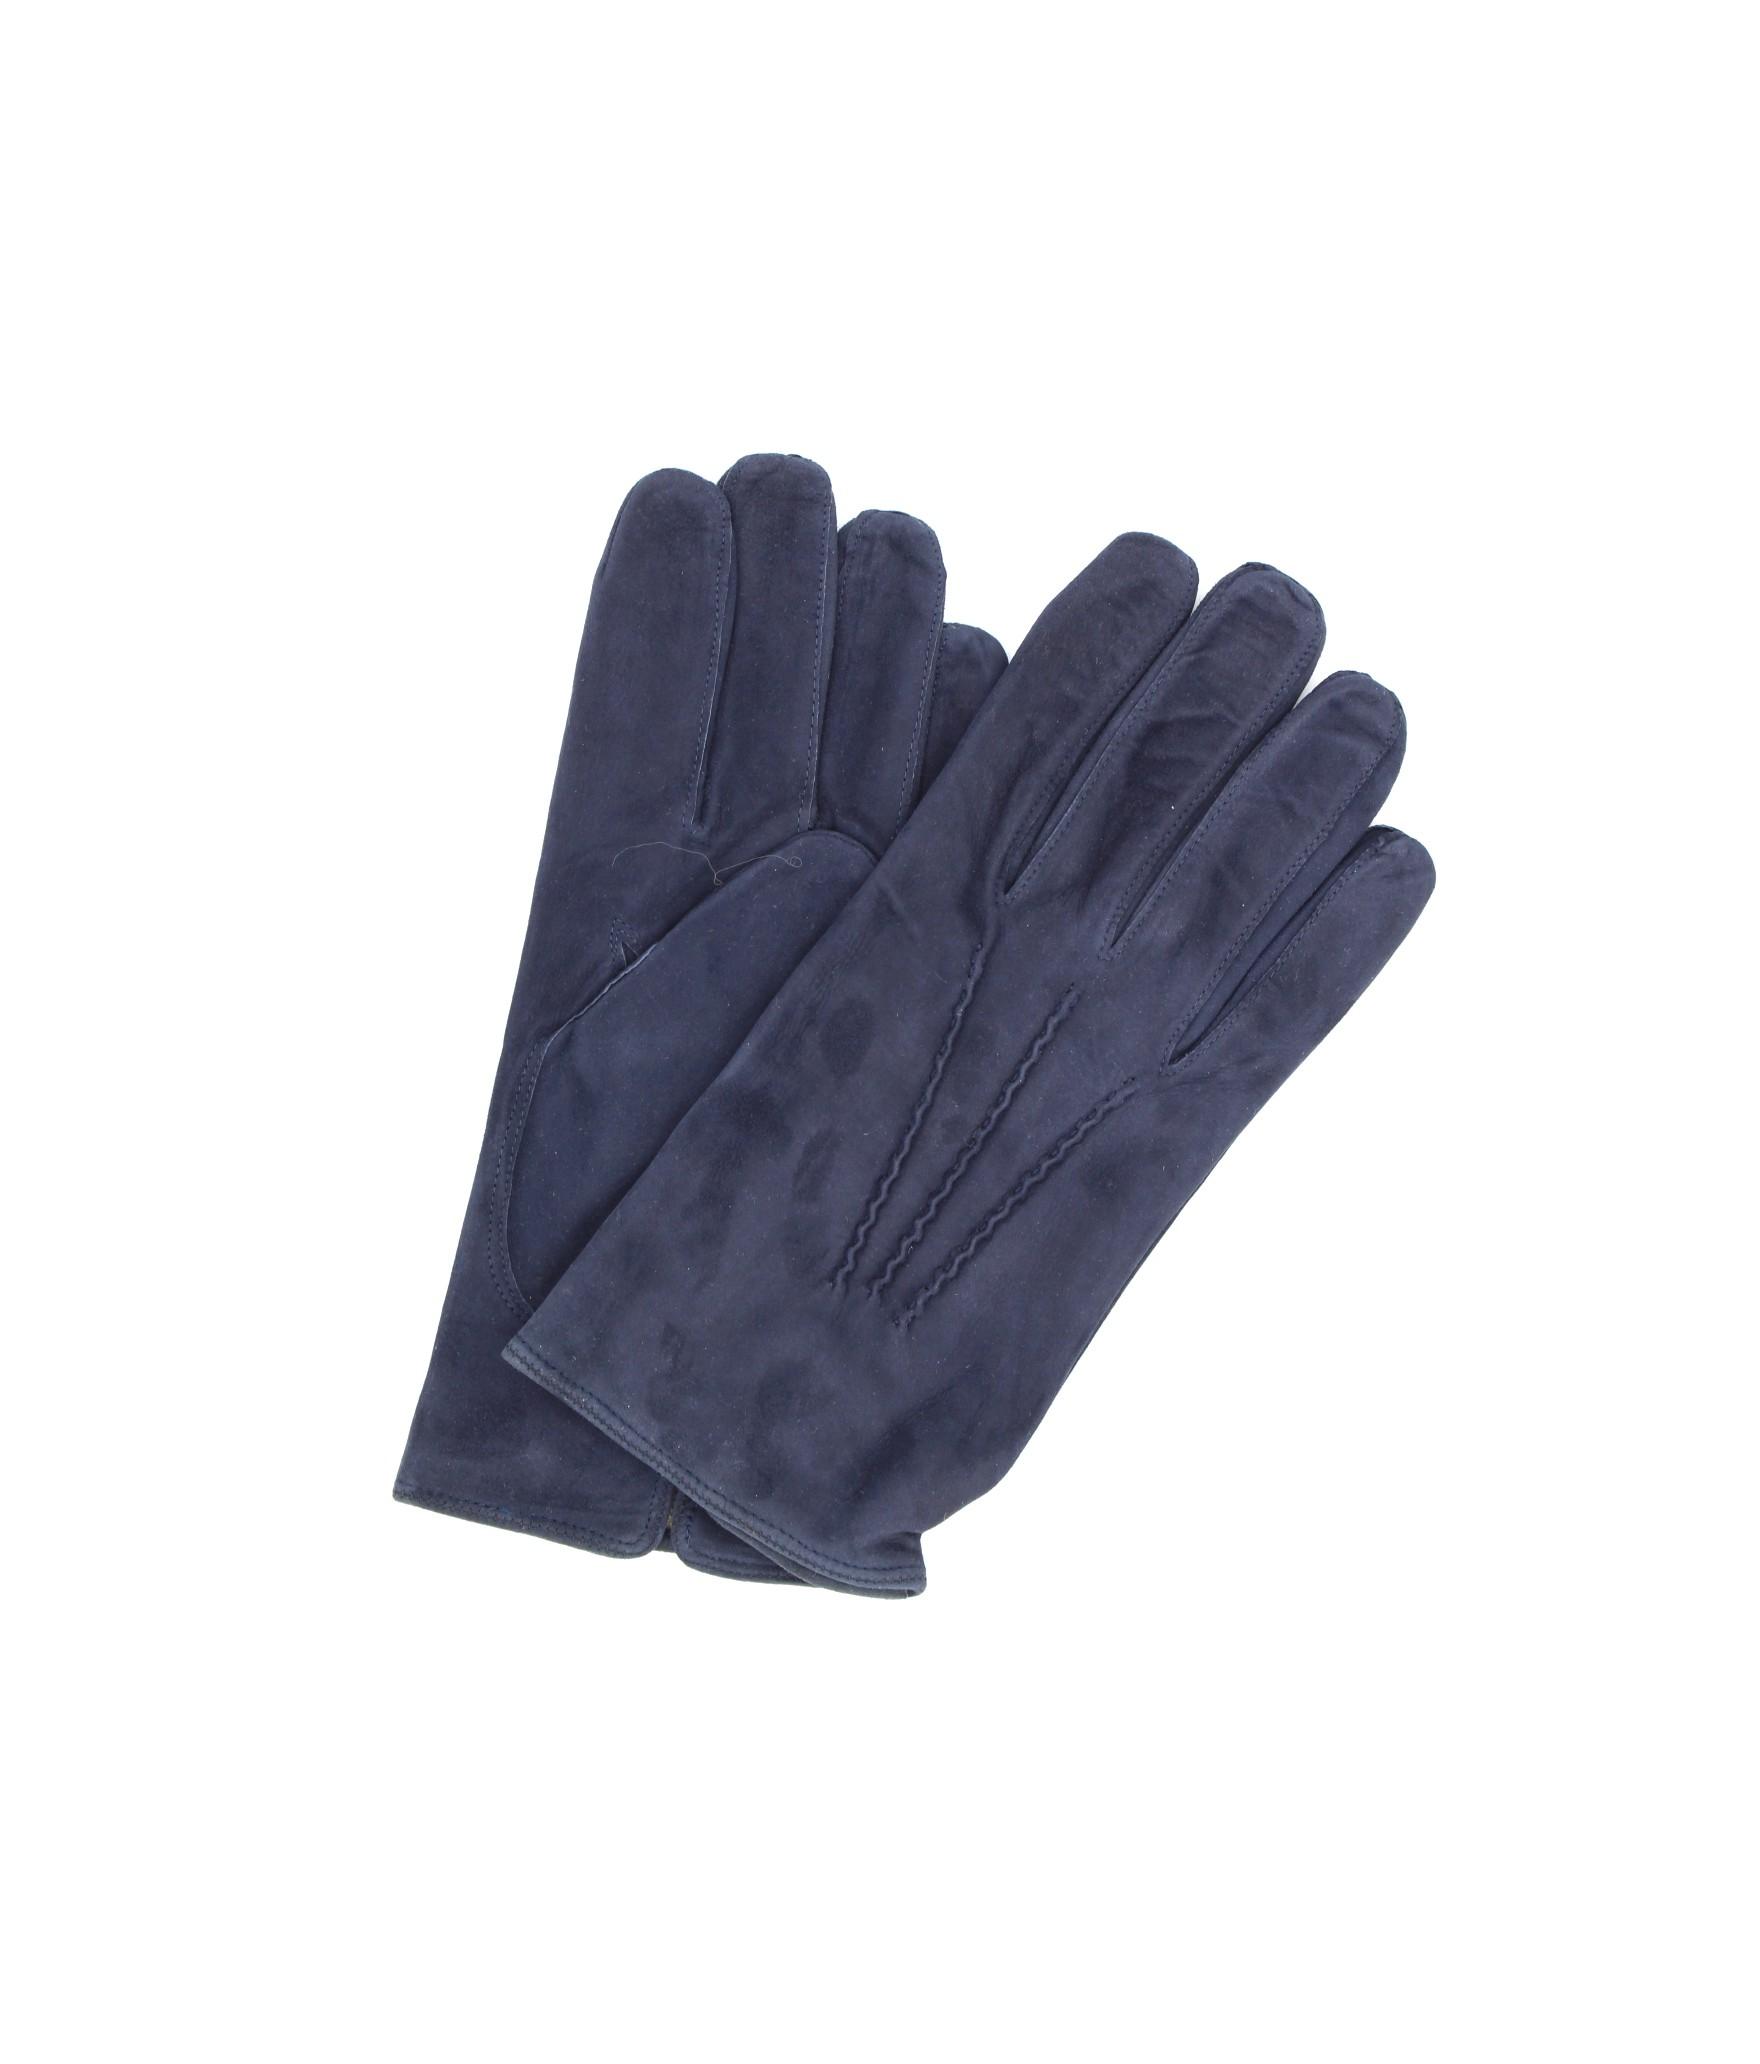 Guanto Pelle scamosciata fodera cashmere Navy Sermoneta Gloves